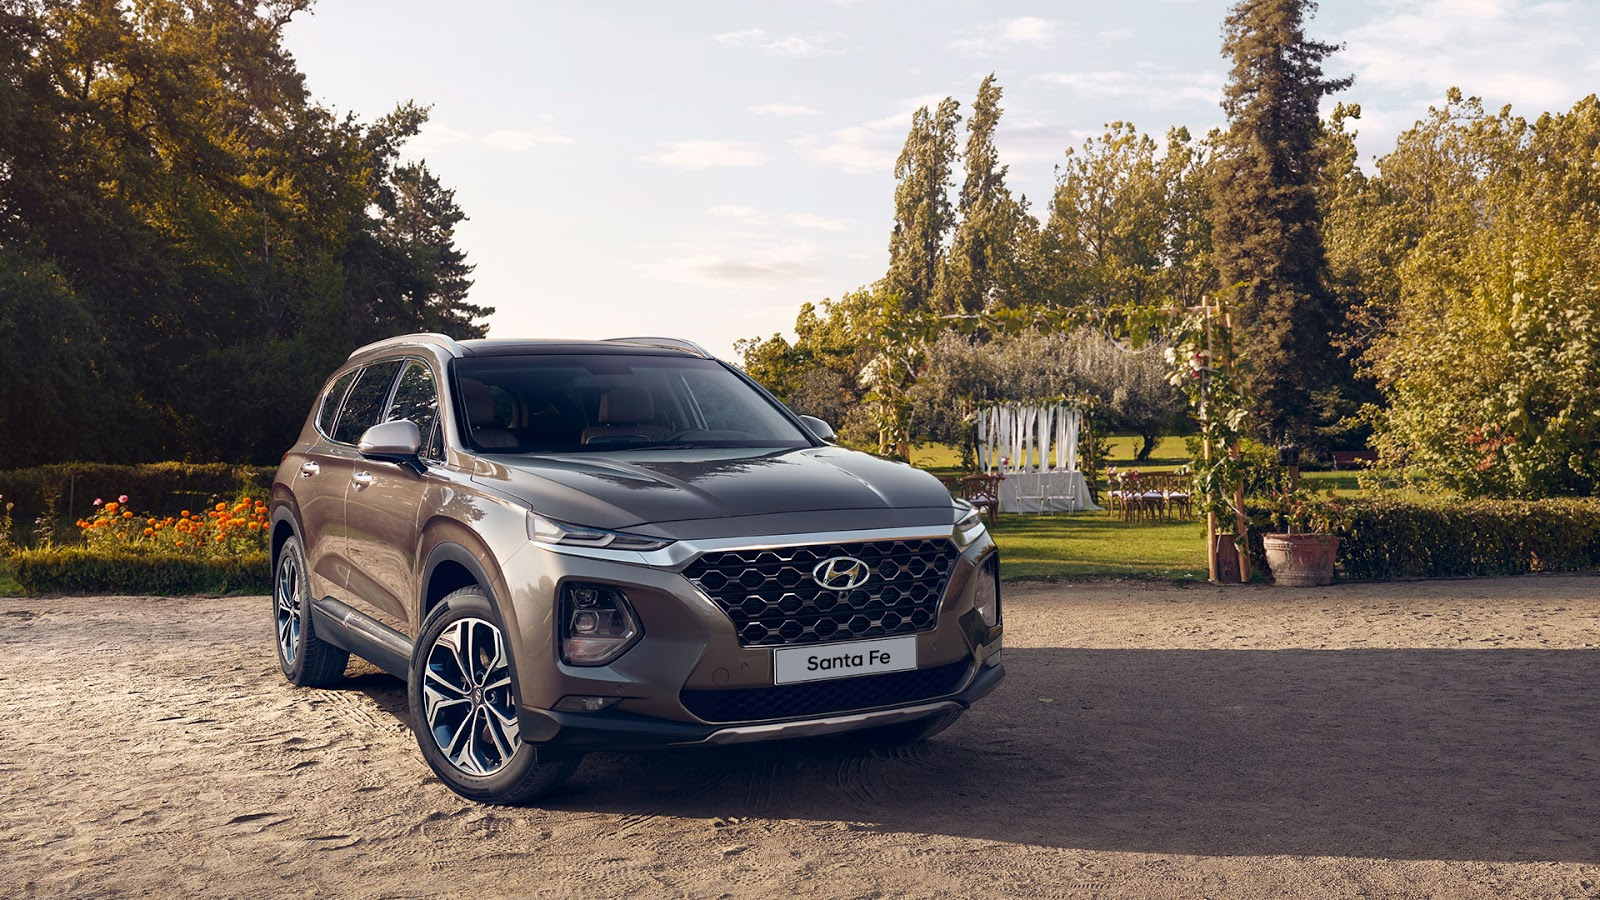 Hyundai Santa Fe 2019 Perfil y frente